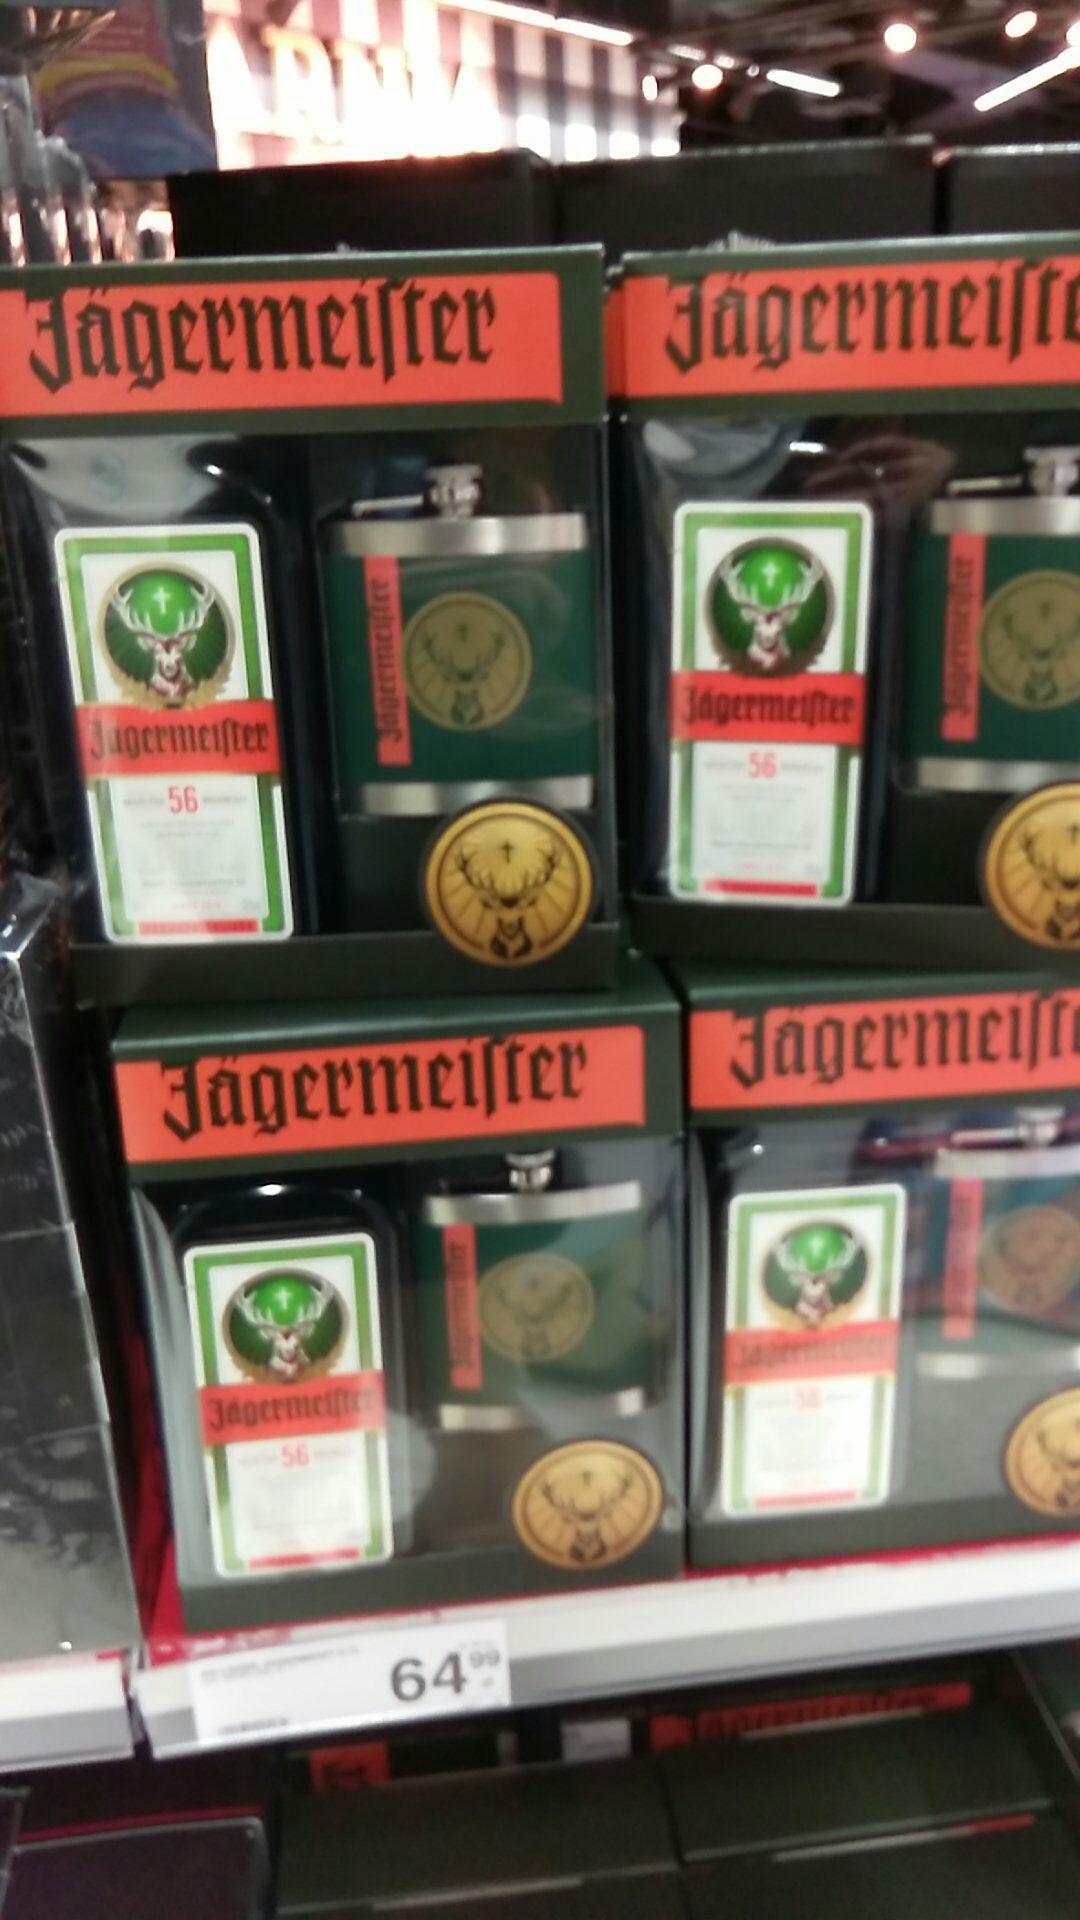 Jägermeister 0.7l + piersiówka Carrefour